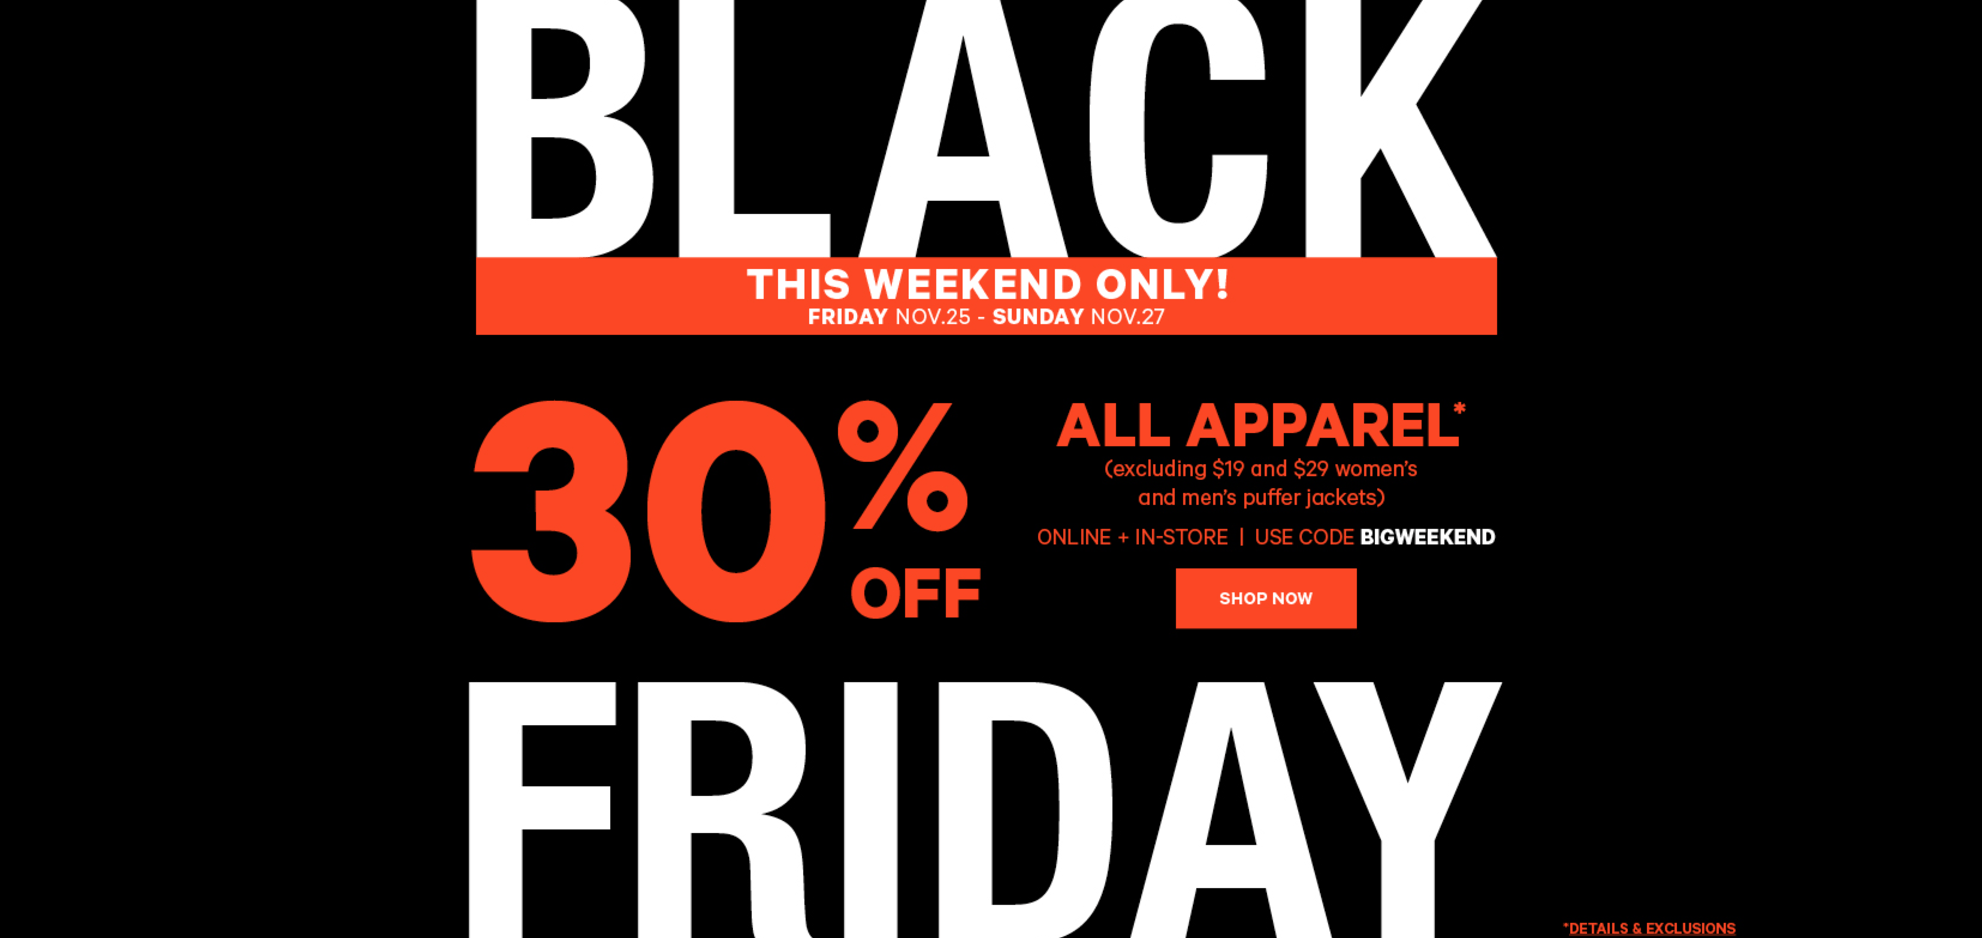 Joe Fresh Canada Black Friday Weekend Sale: Save 30% Off All Apparel + 50% Off Puffer Jackets!